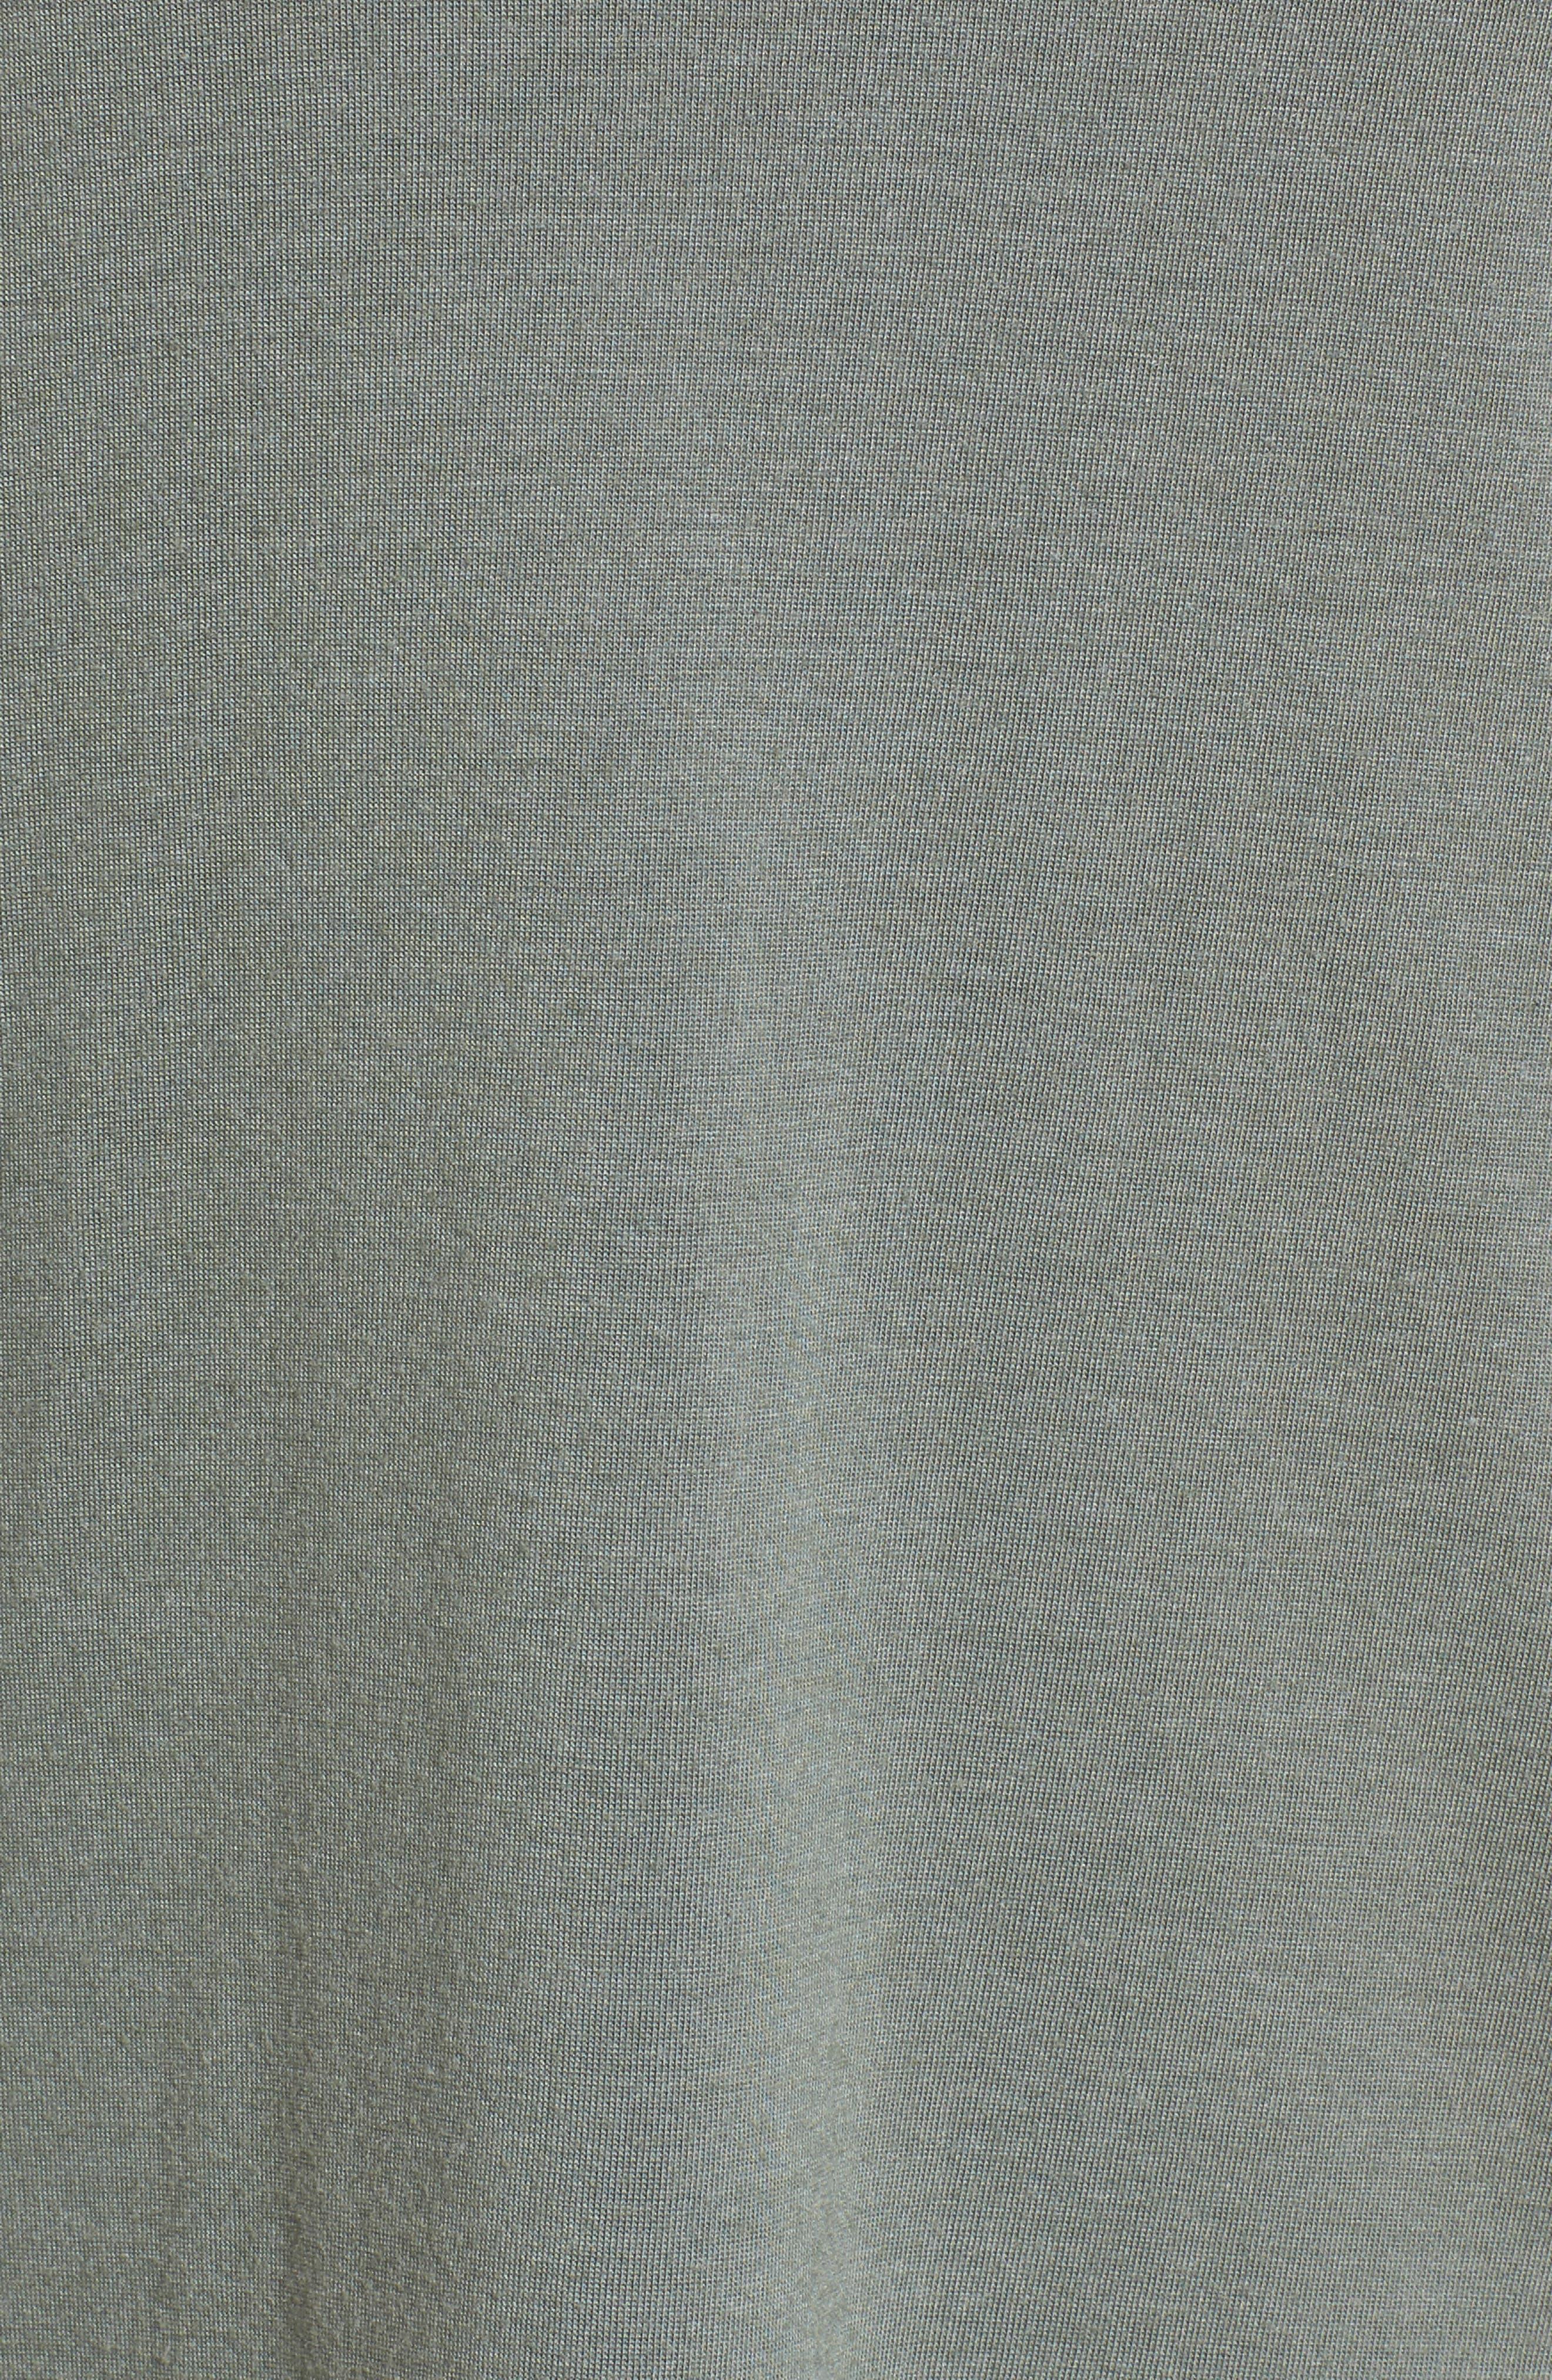 Hetland Tee,                             Alternate thumbnail 5, color,                             300